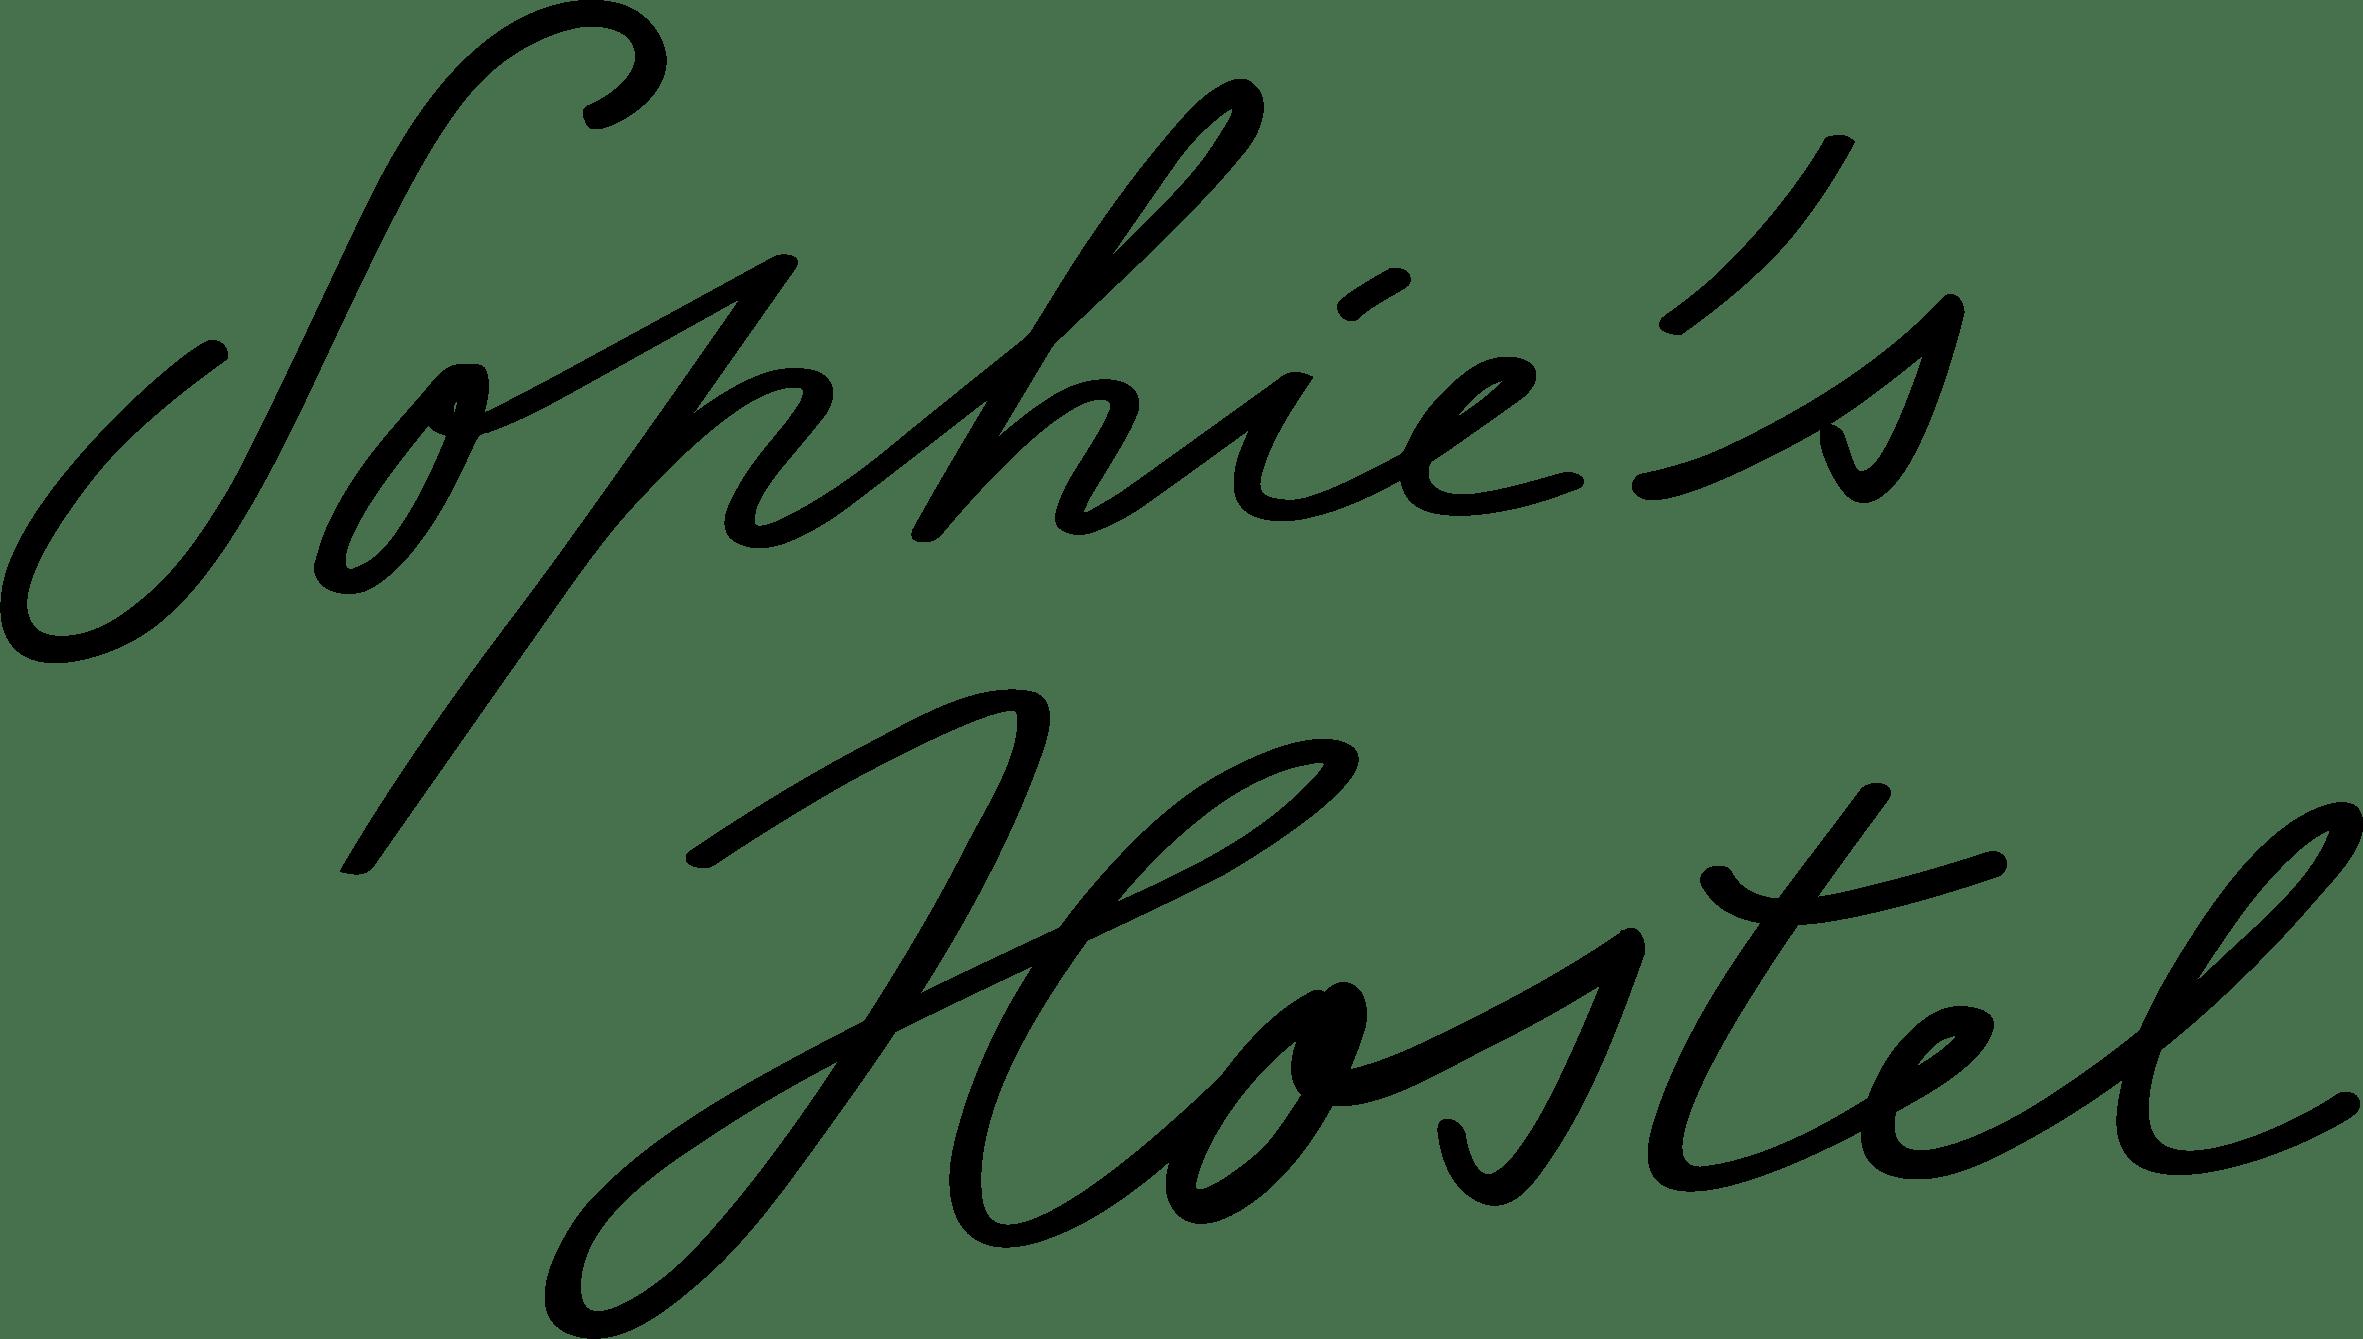 sophie's hostel logo